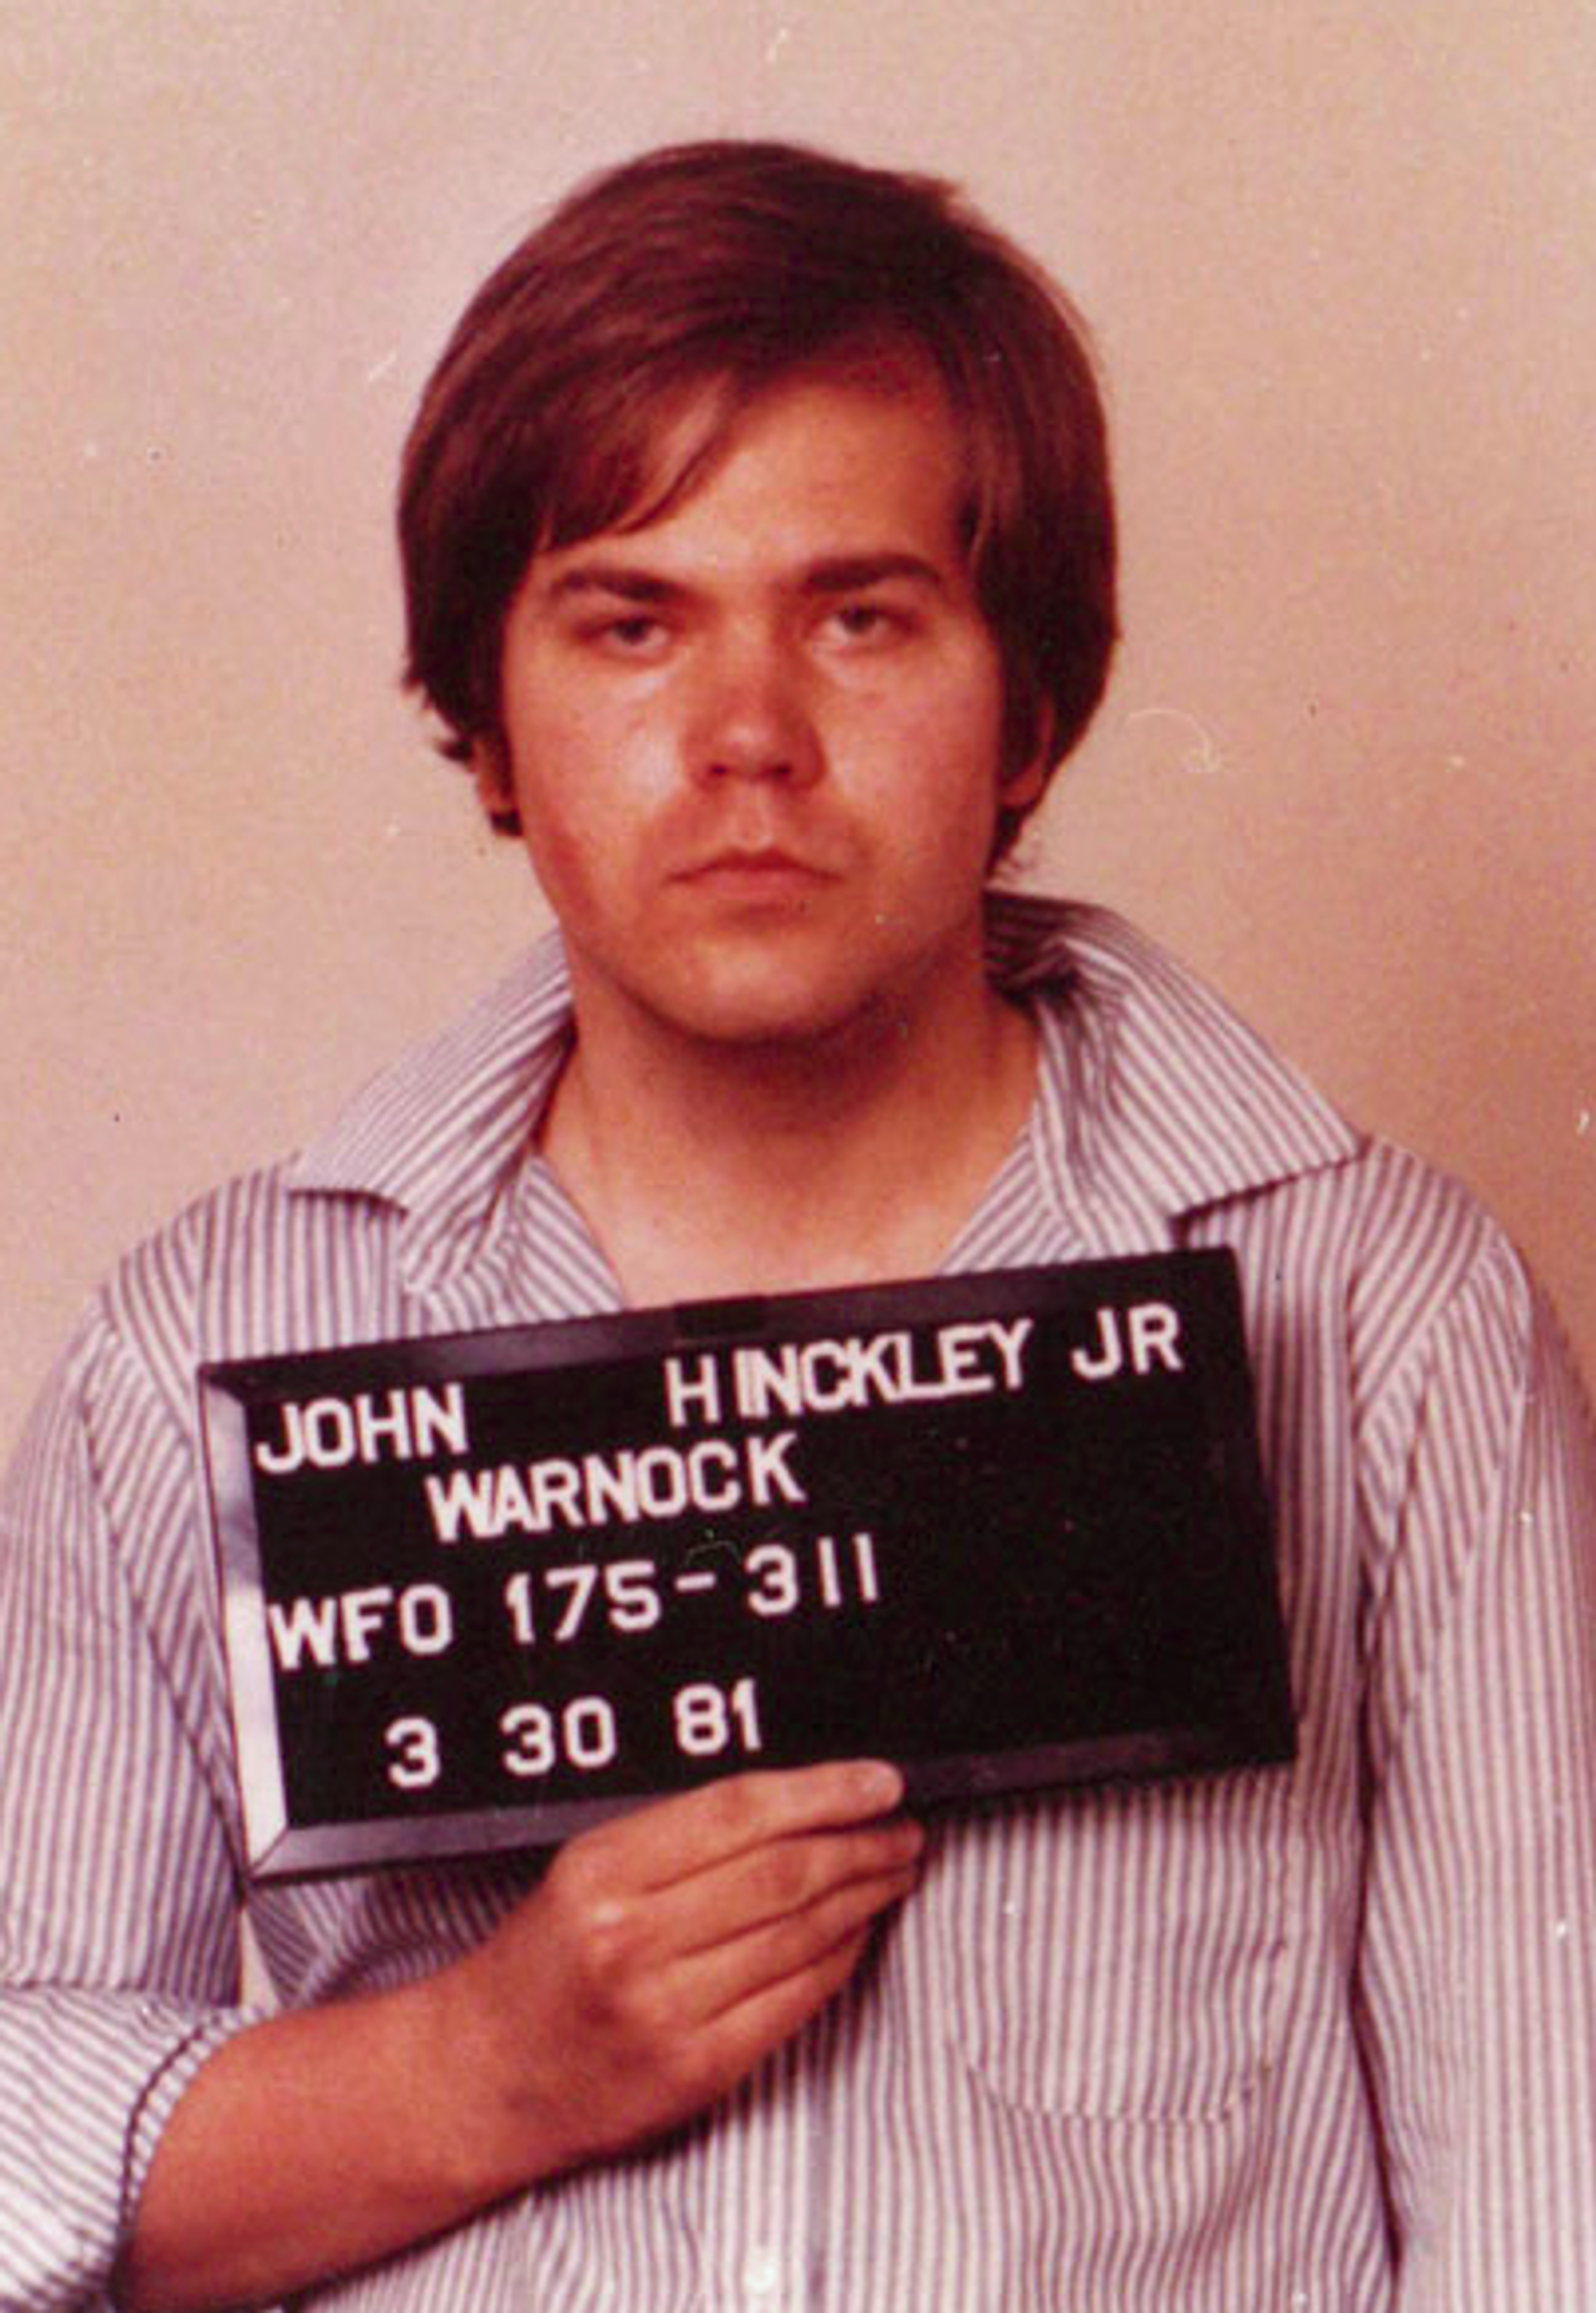 John Hinckley en 1981 - Sputnik Mundo, 1920, 27.09.2021